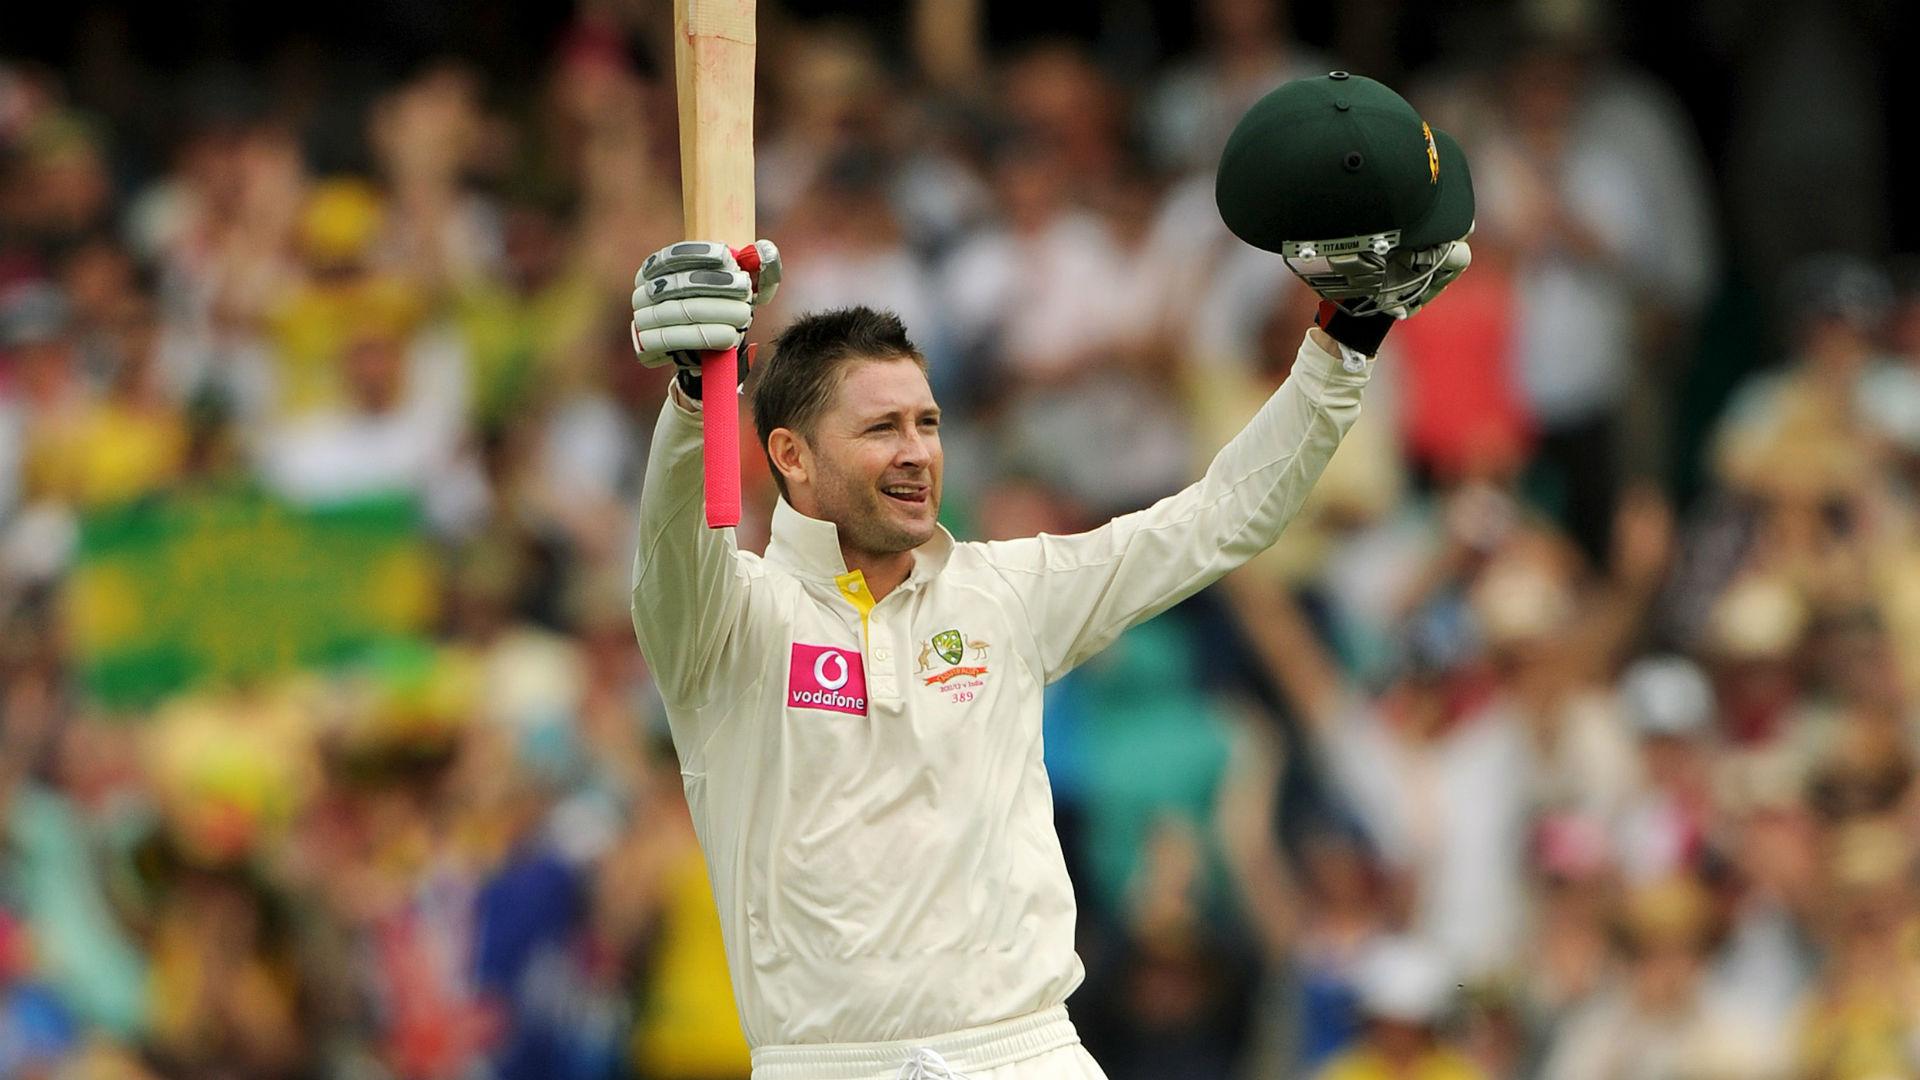 Australia captain Michael Clarke career highlights following retirement |  Sporting News Australia